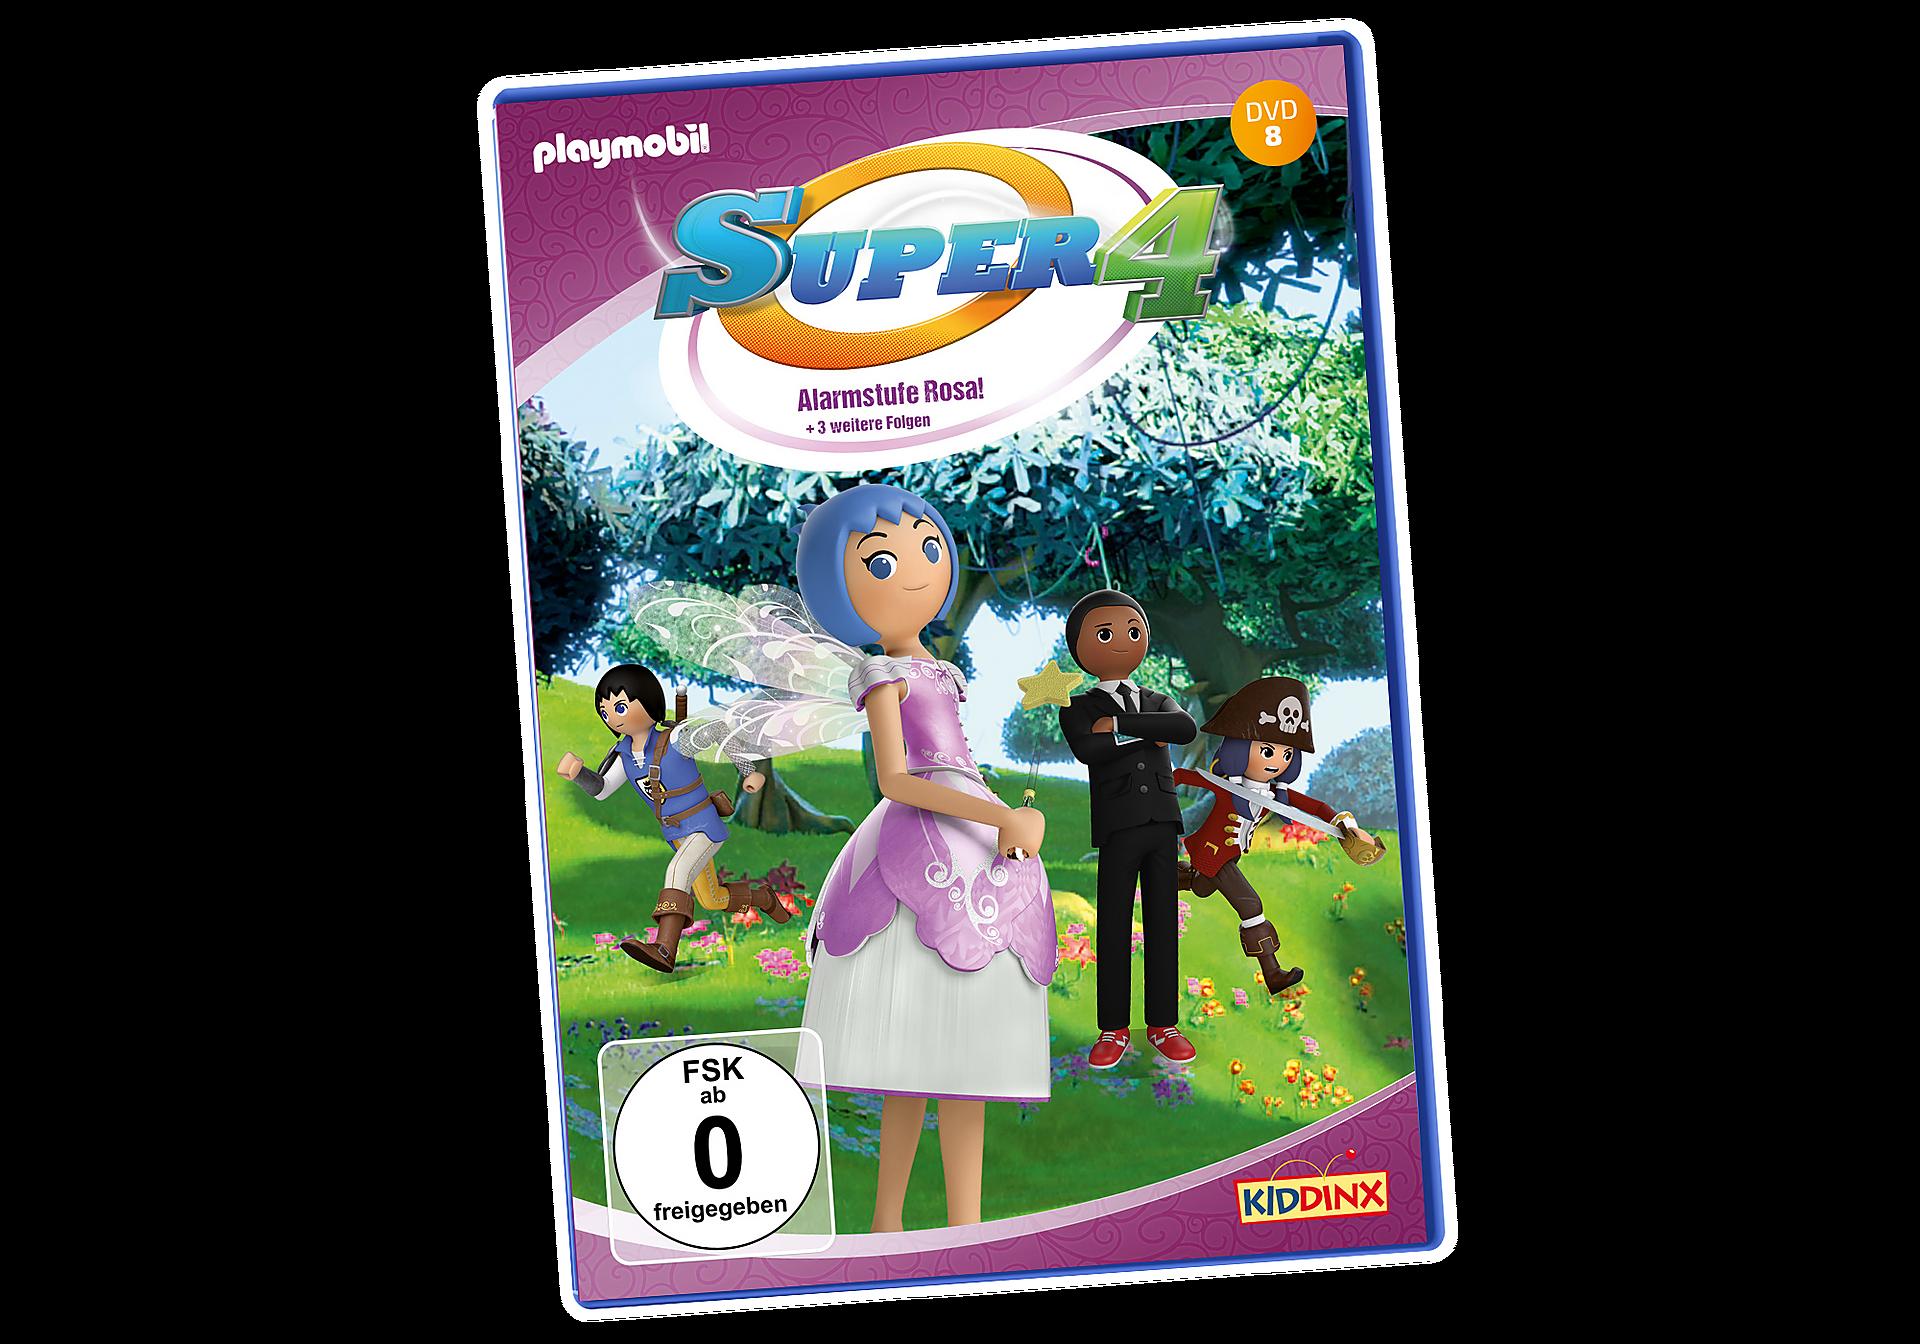 80020 DVD Super4: Alarmstufe Rosa! zoom image1